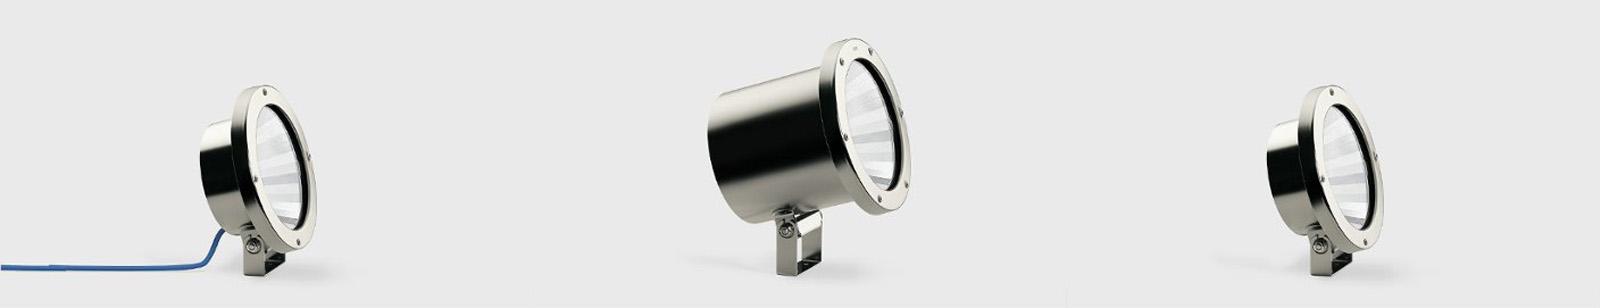 Luminaire lighting for swimming pool desert turfcare general trading for Underwater luminaire for swimming pool